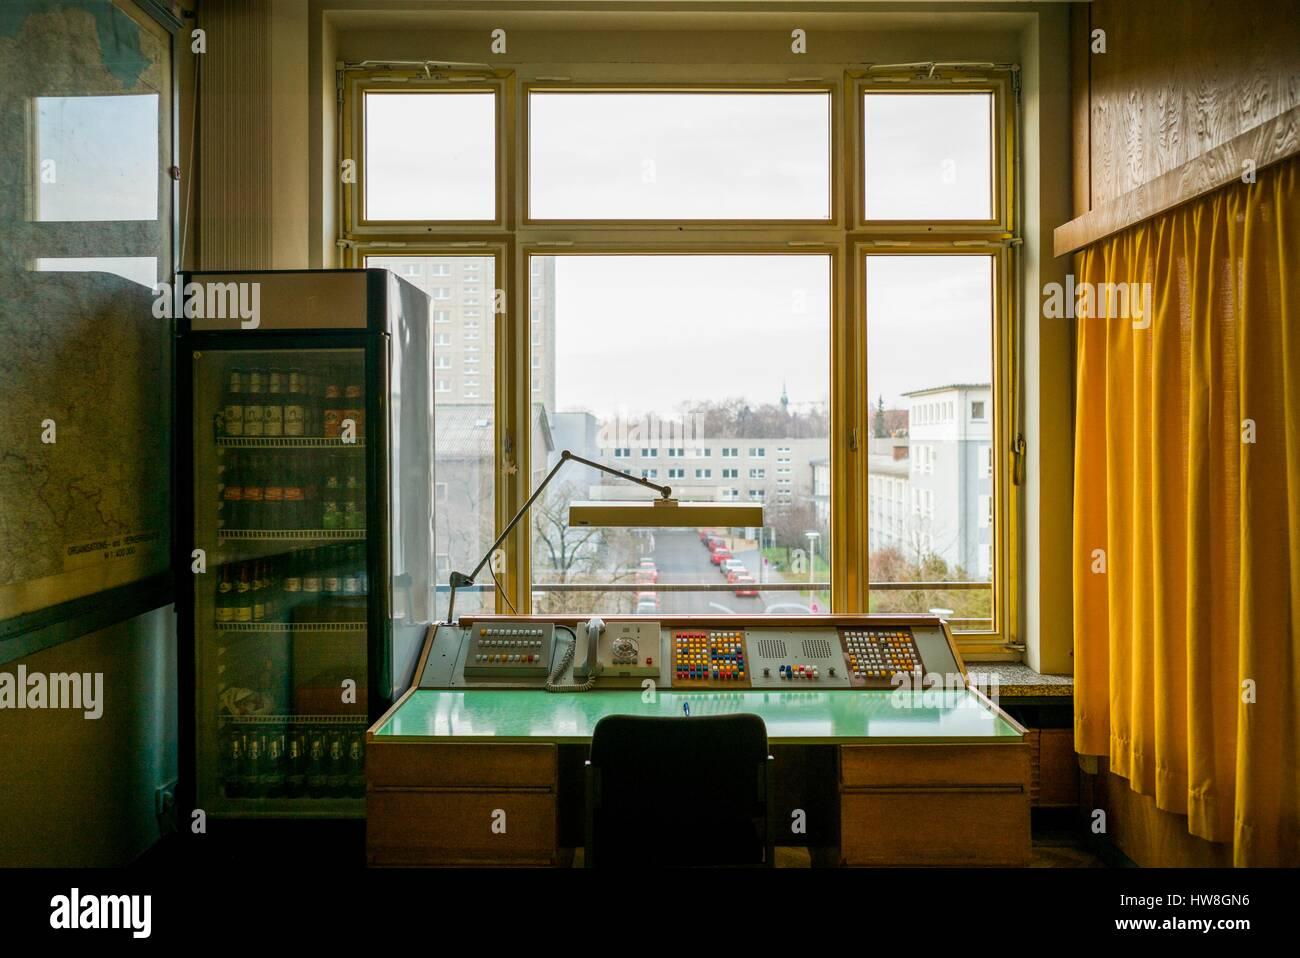 Germany, Berlin, Friendrichshain, Stasi Museum, DDR-era secret police museum in former secret police headquarters, Stock Photo